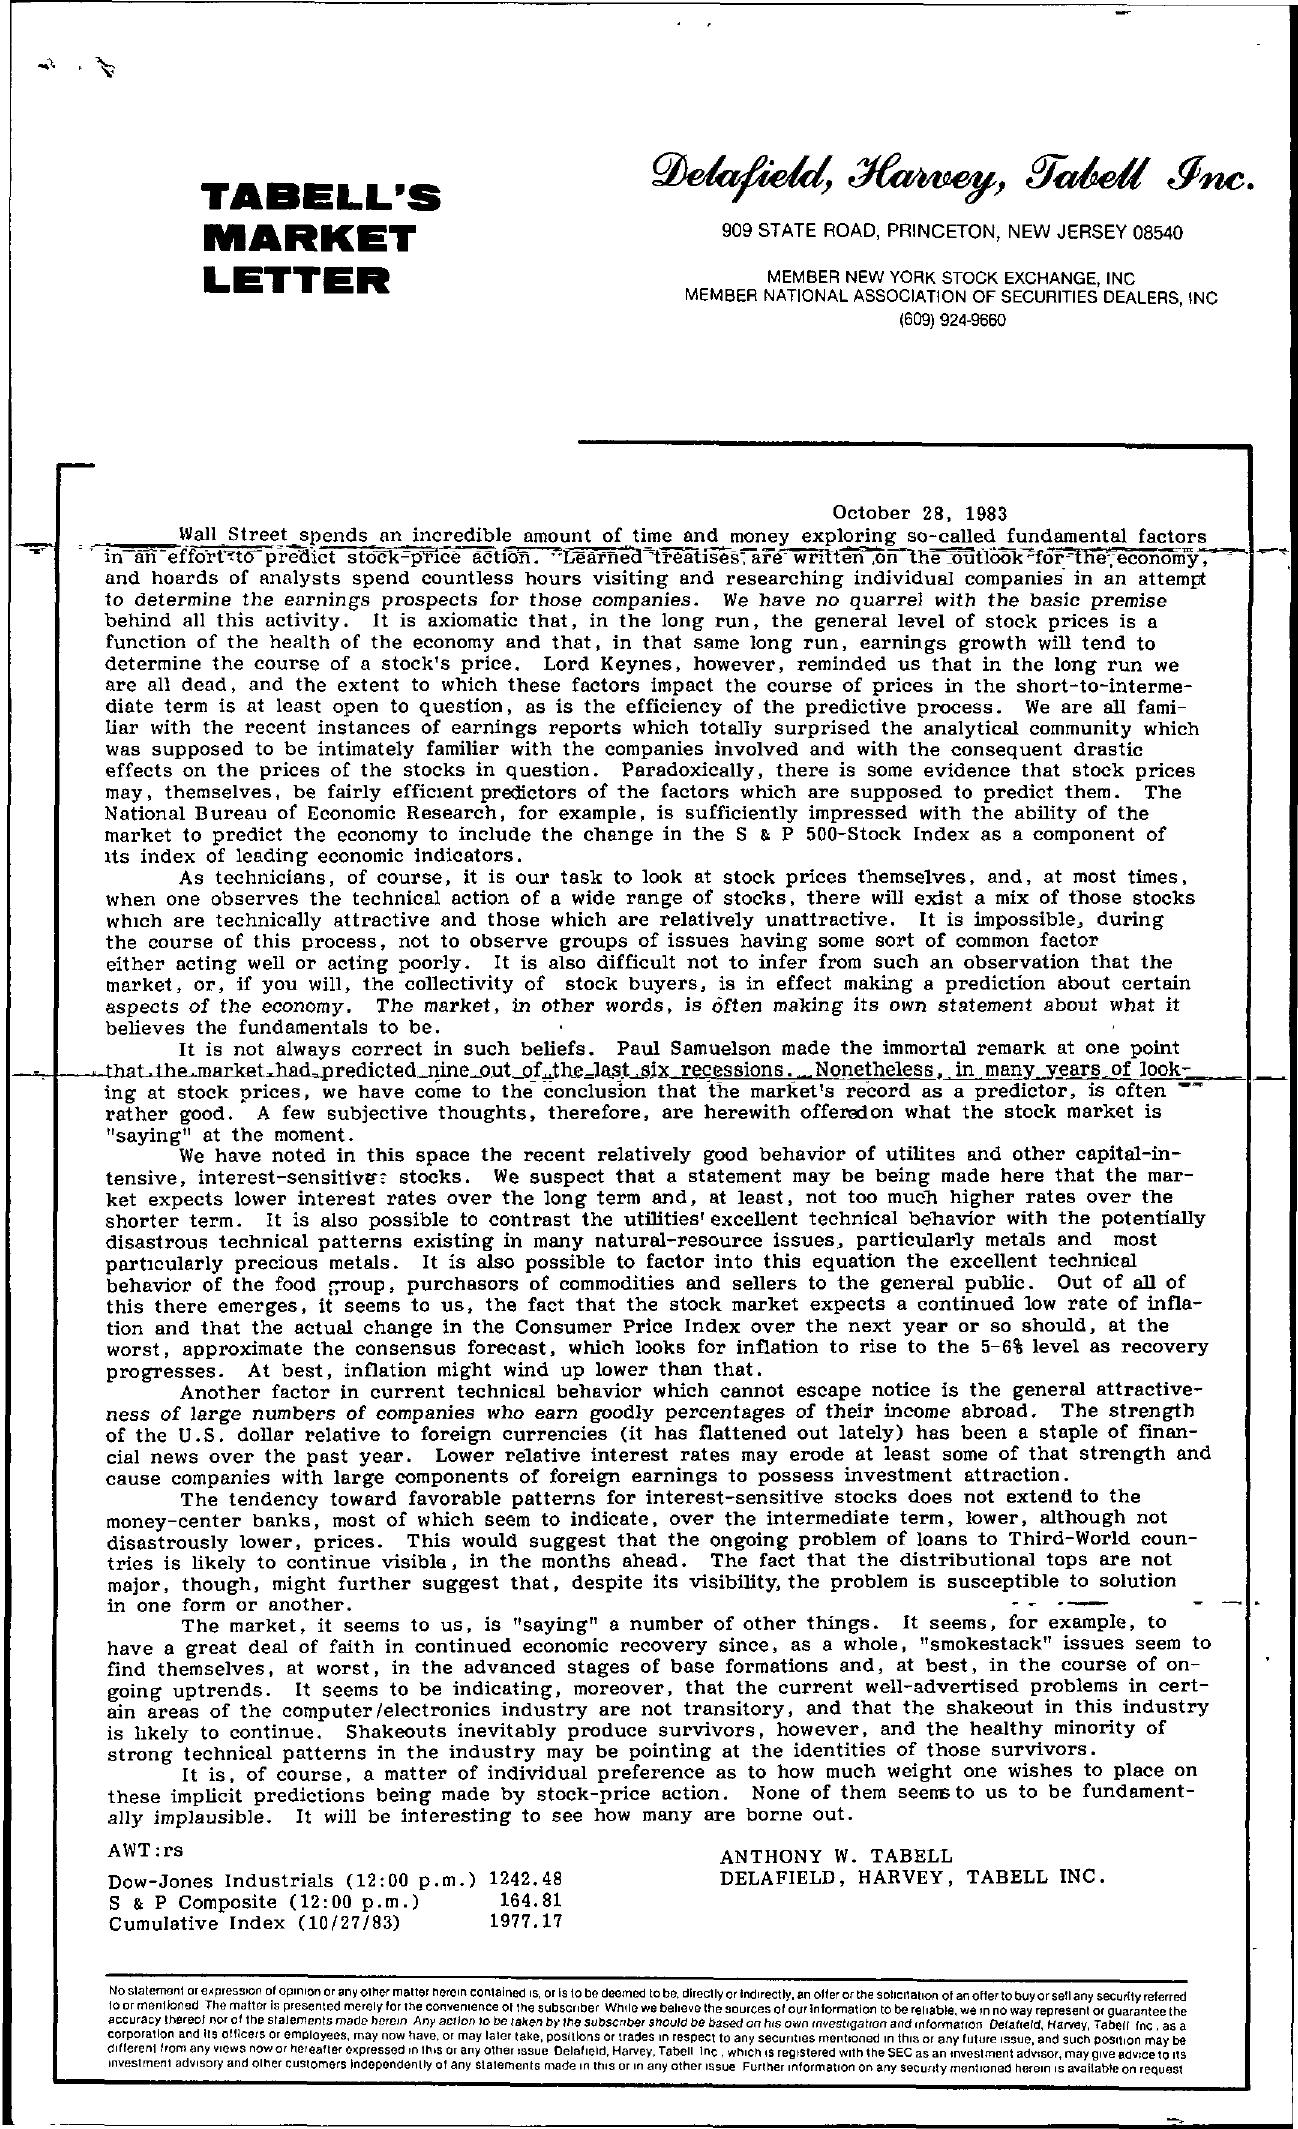 Tabell's Market Letter - October 28, 1983